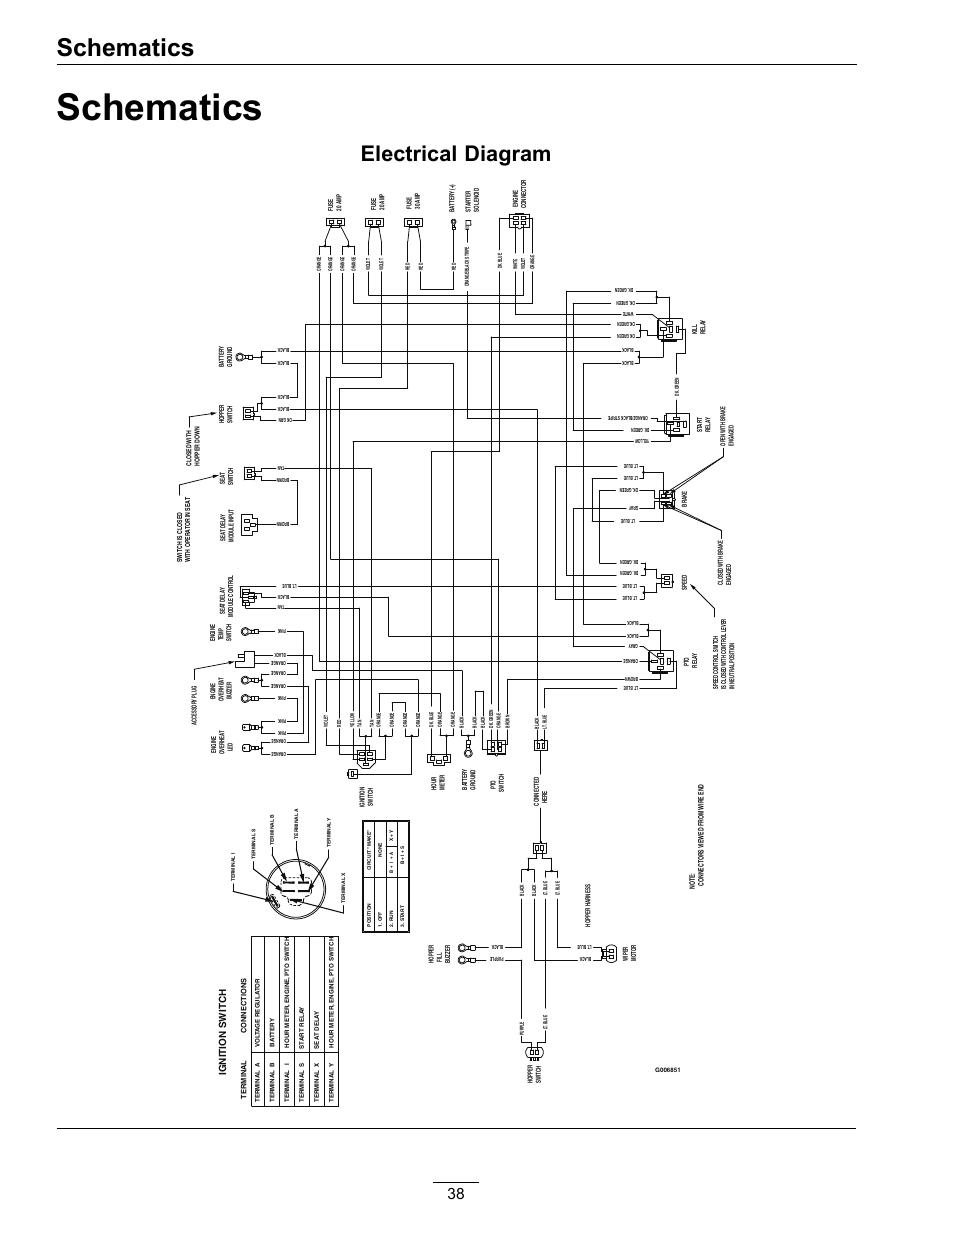 schematics, electrical diagram | exmark navigator 4500-367 user manual |  page 38 / 44 | original mode  manuals directory